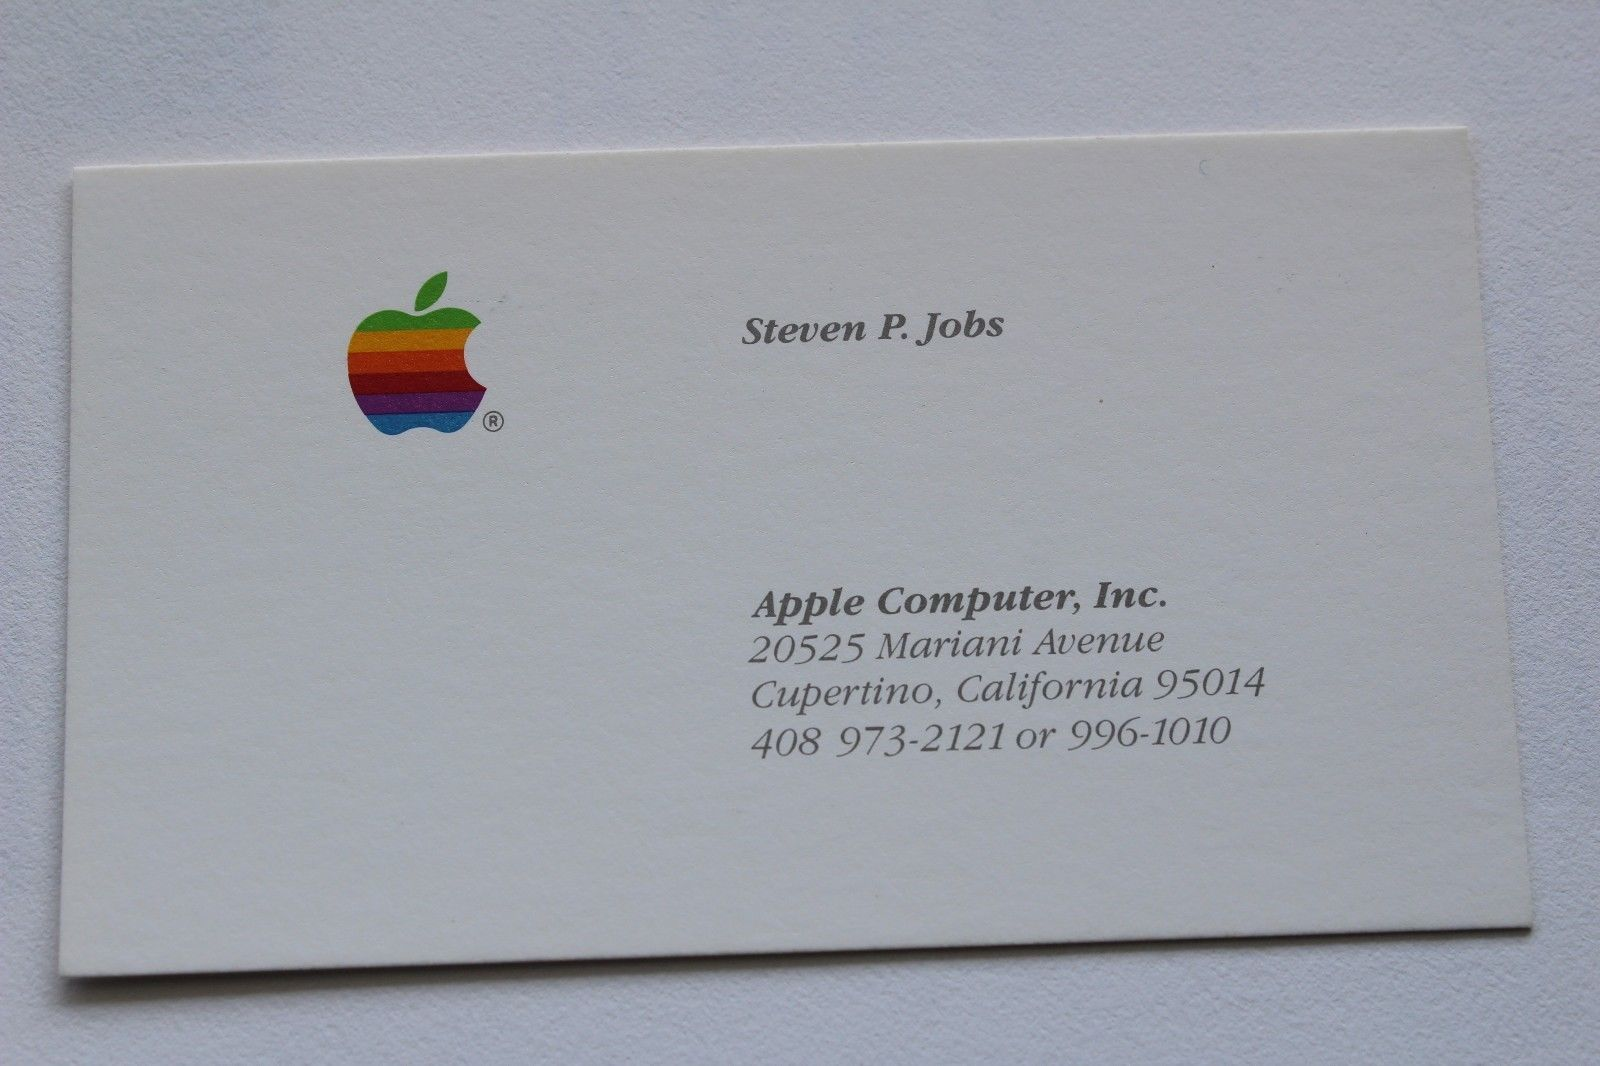 Steve Jobs 1985 Business Card Ceo Business Card Steve Jobs Apple Computer